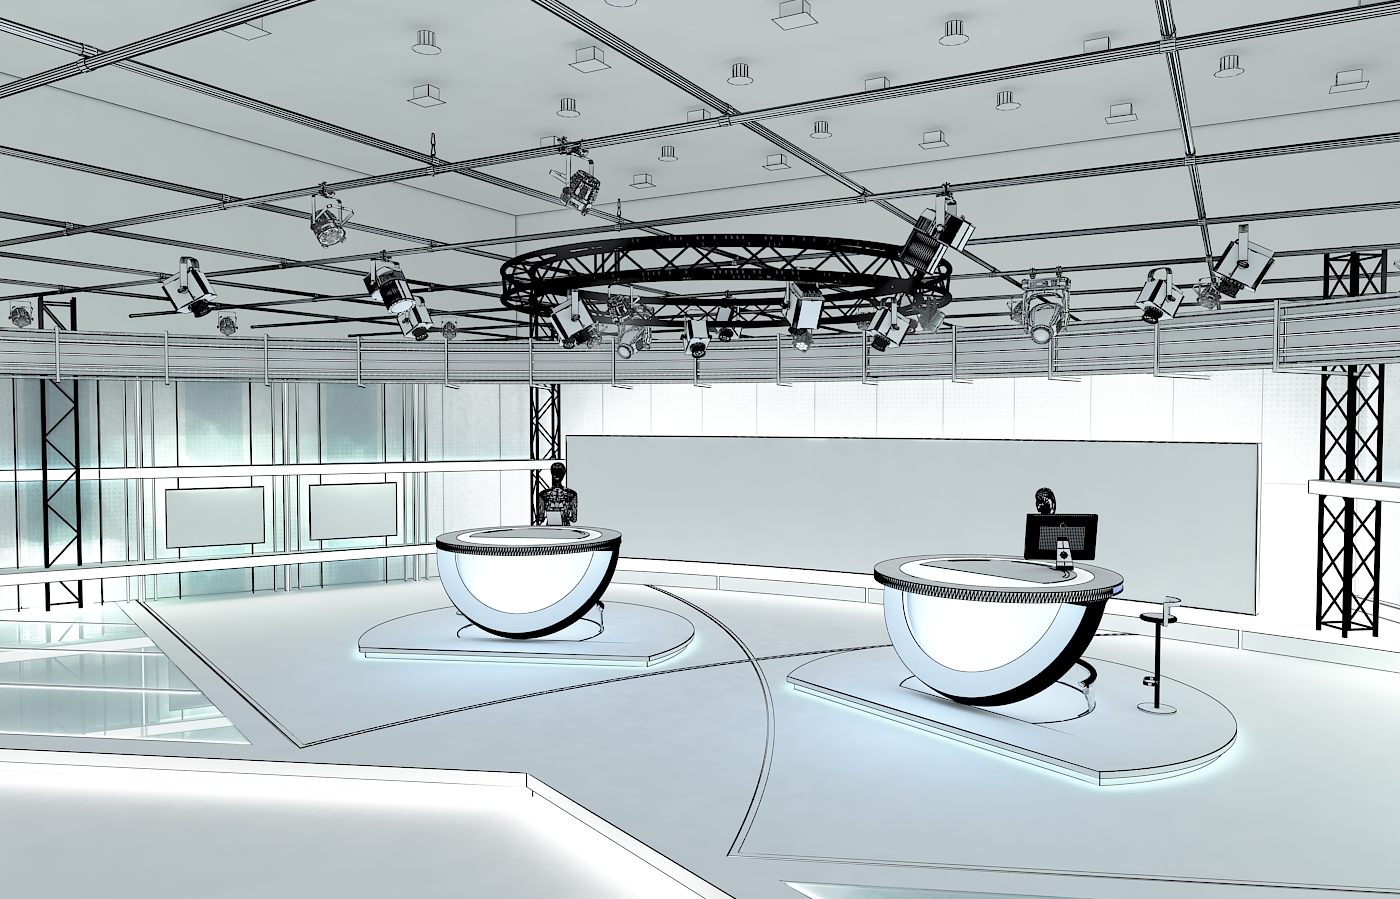 виртуал телевизийн студи цуглуулга vol 6 3d загвар max dxf dwg fbx obj 223400